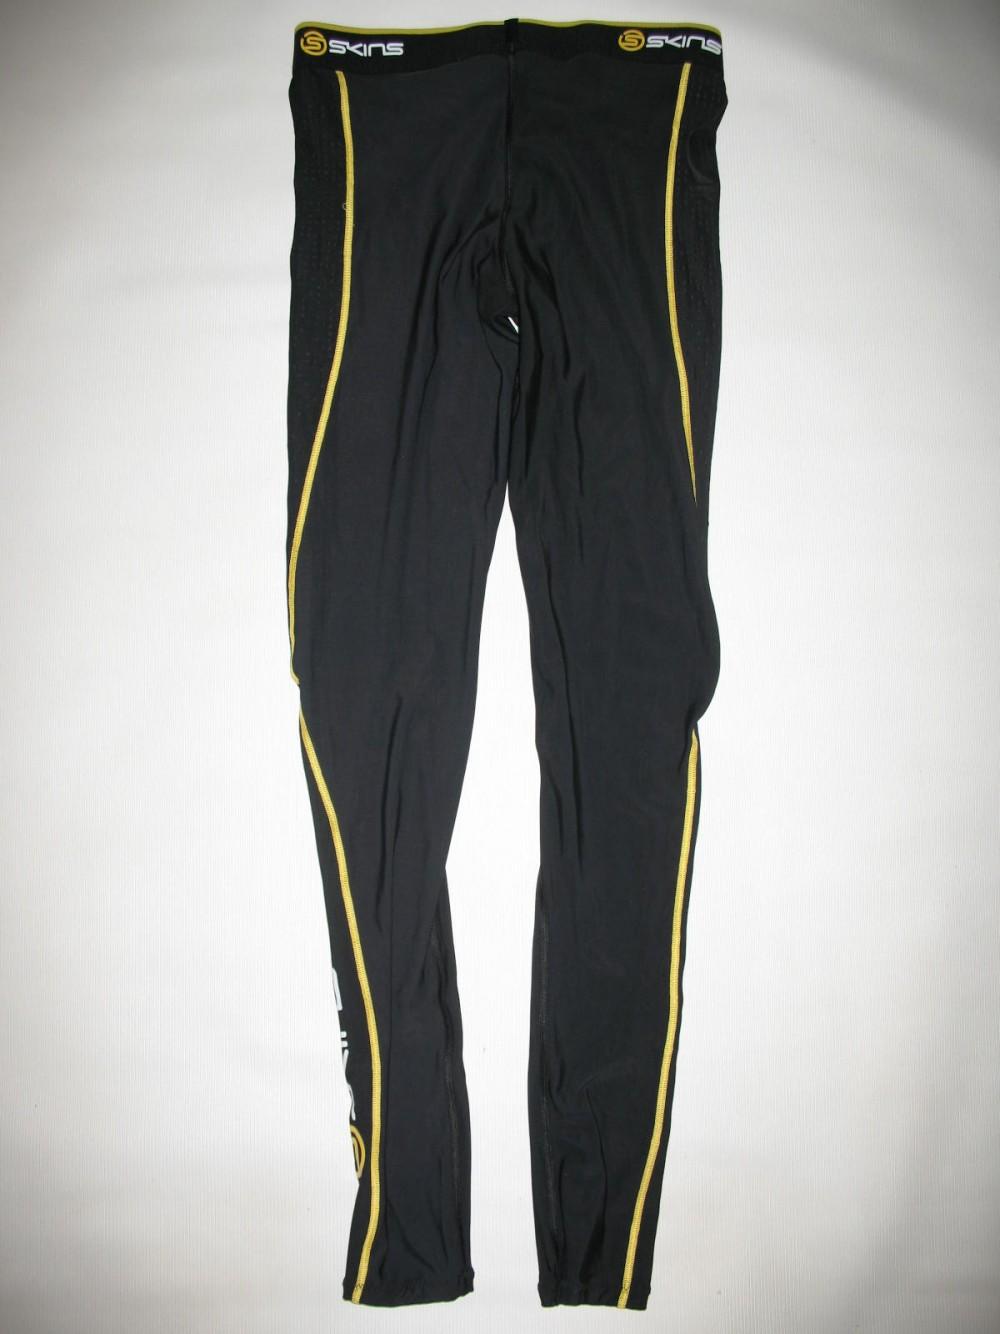 Футболка+брюки SKINS A200  short sleeves jersey+ long tights (размер M) - 5